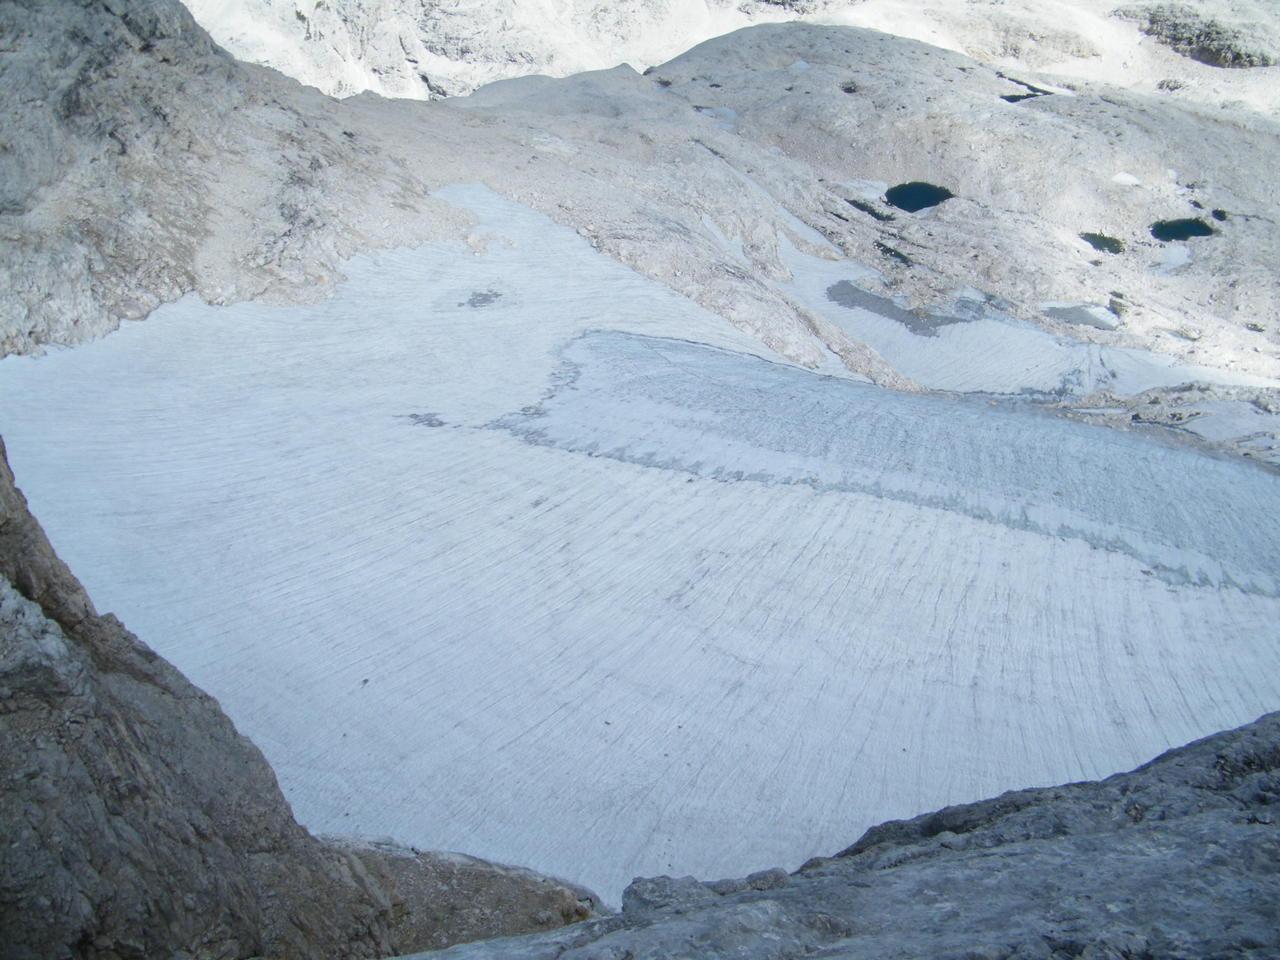 ghiacciaio della fradusta-dscf6397.jpg